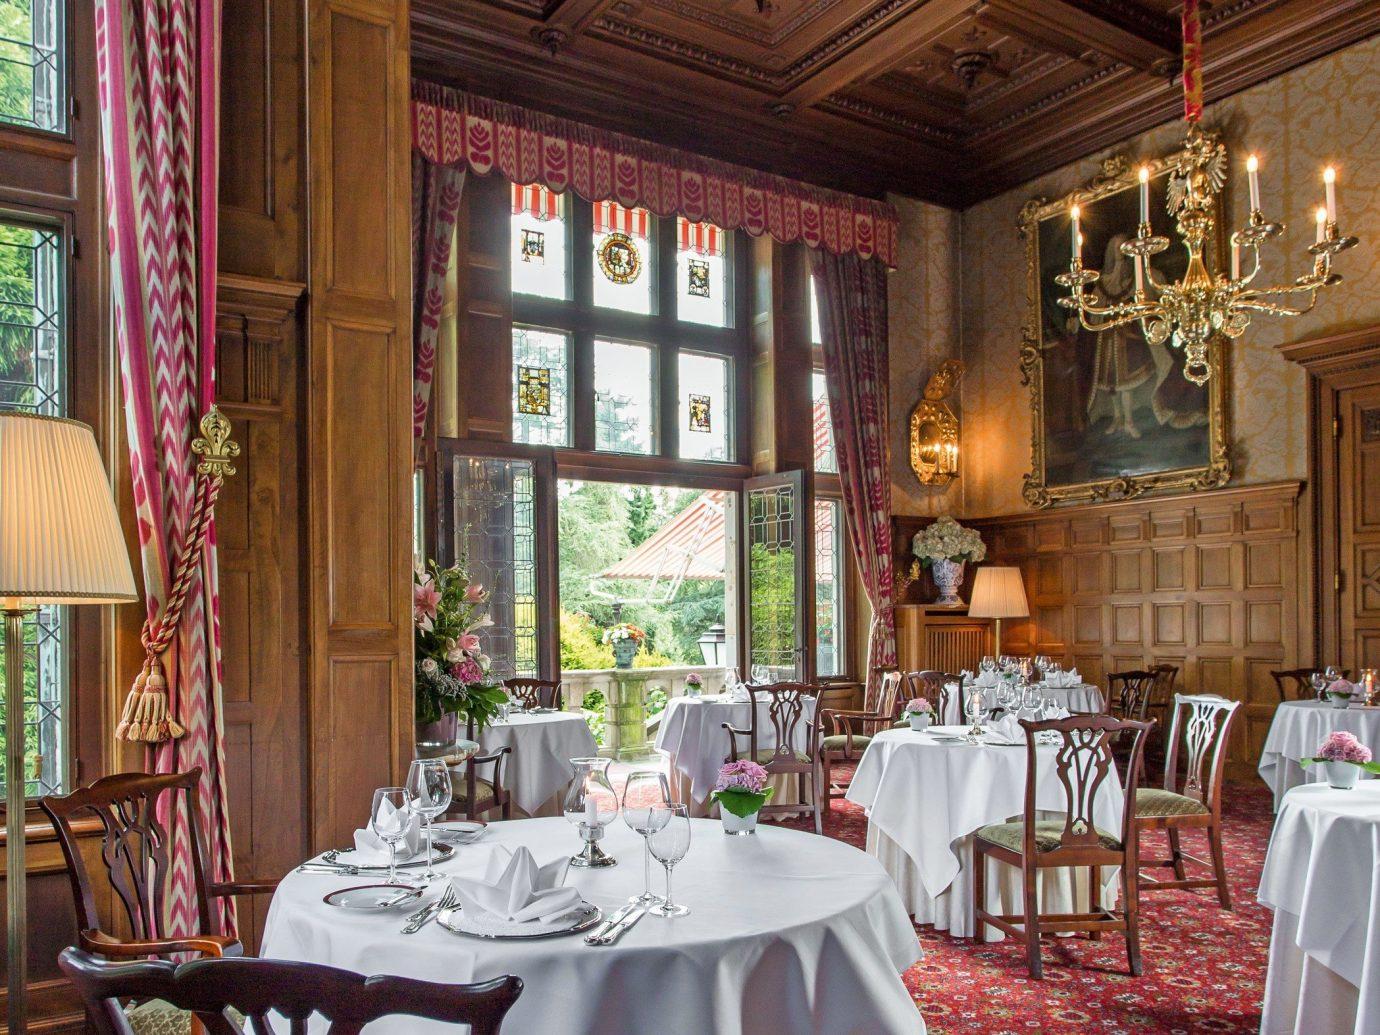 Hotels Landmarks Luxury Travel indoor floor room chair window meal restaurant estate function hall dining room interior design ballroom furniture decorated area fancy